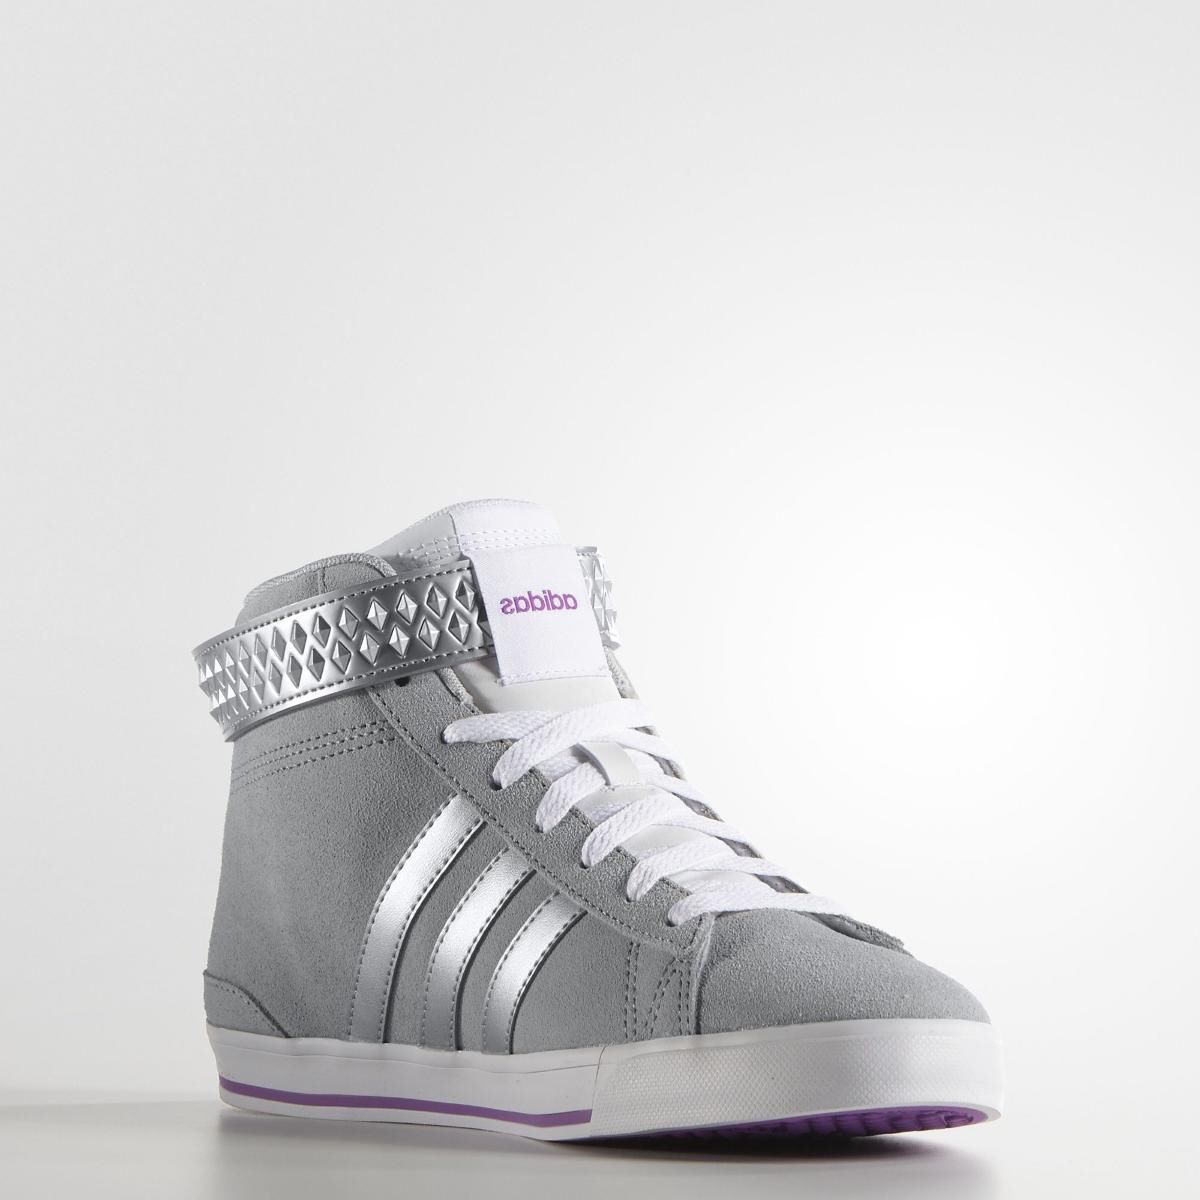 7ef5f9853 Tênis Feminino Cano Alto Adidas Daily Twist Mid - BRACIA SHOP: Loja ...